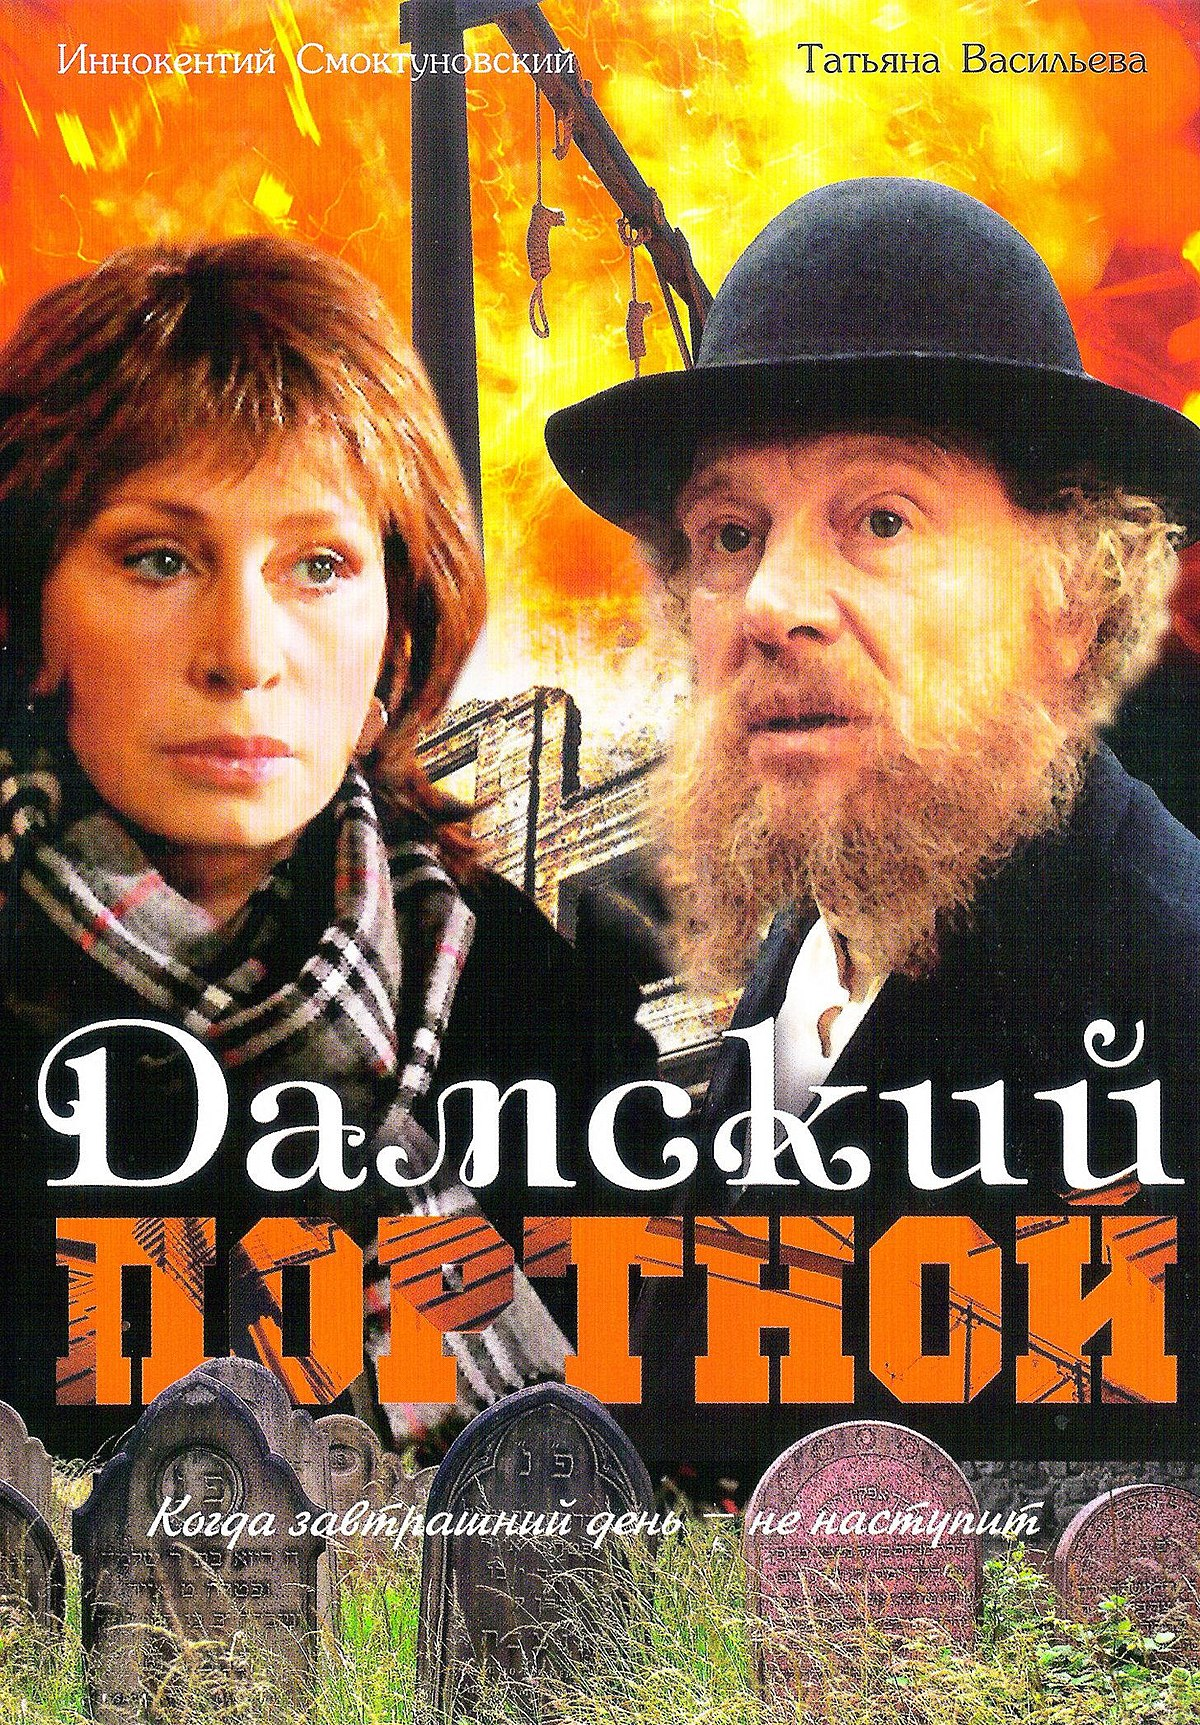 Actor Alexei Gorbunov: biography, filmography, personal life, interesting facts